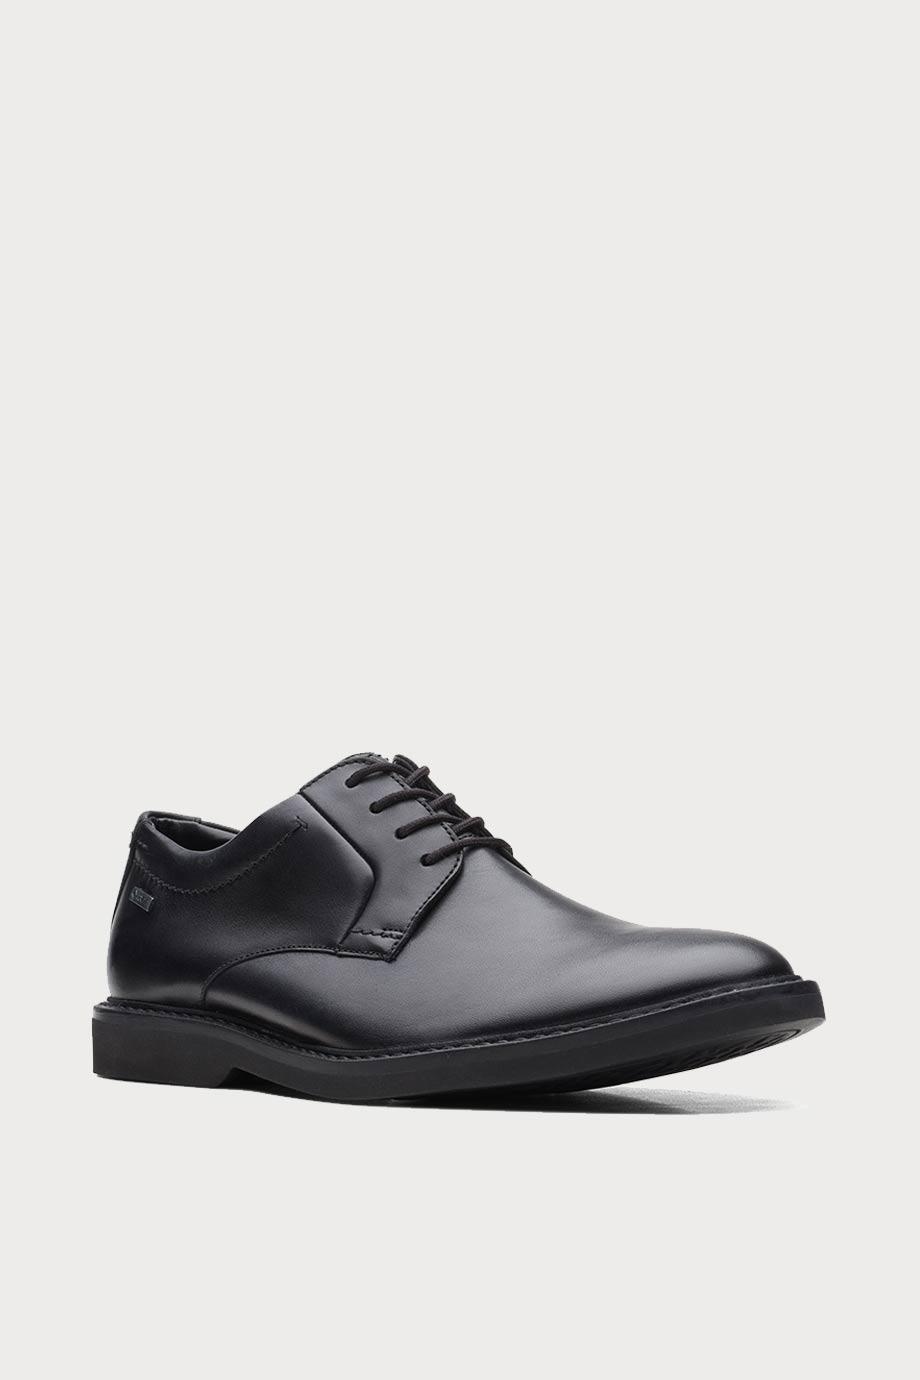 spiridoula metheniti shoes xalkida p AtticusLTLoGTX black leather clarks 2